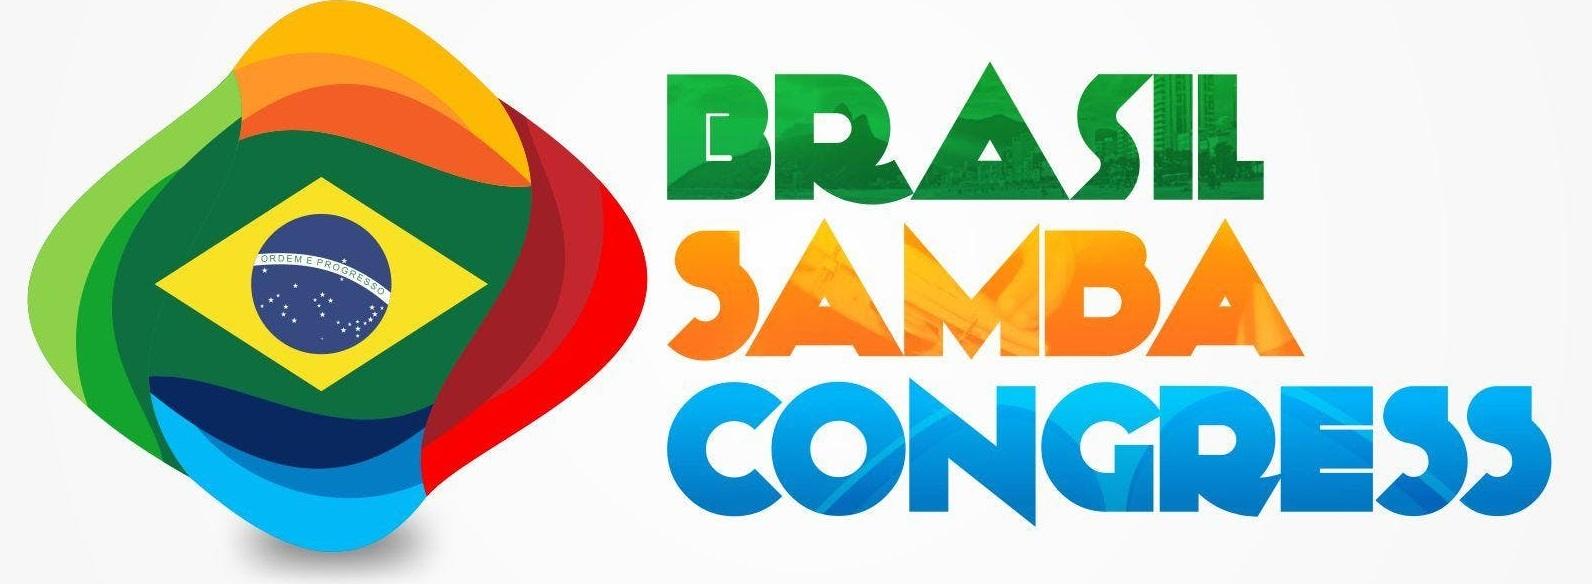 brasilsambacongress.jpg